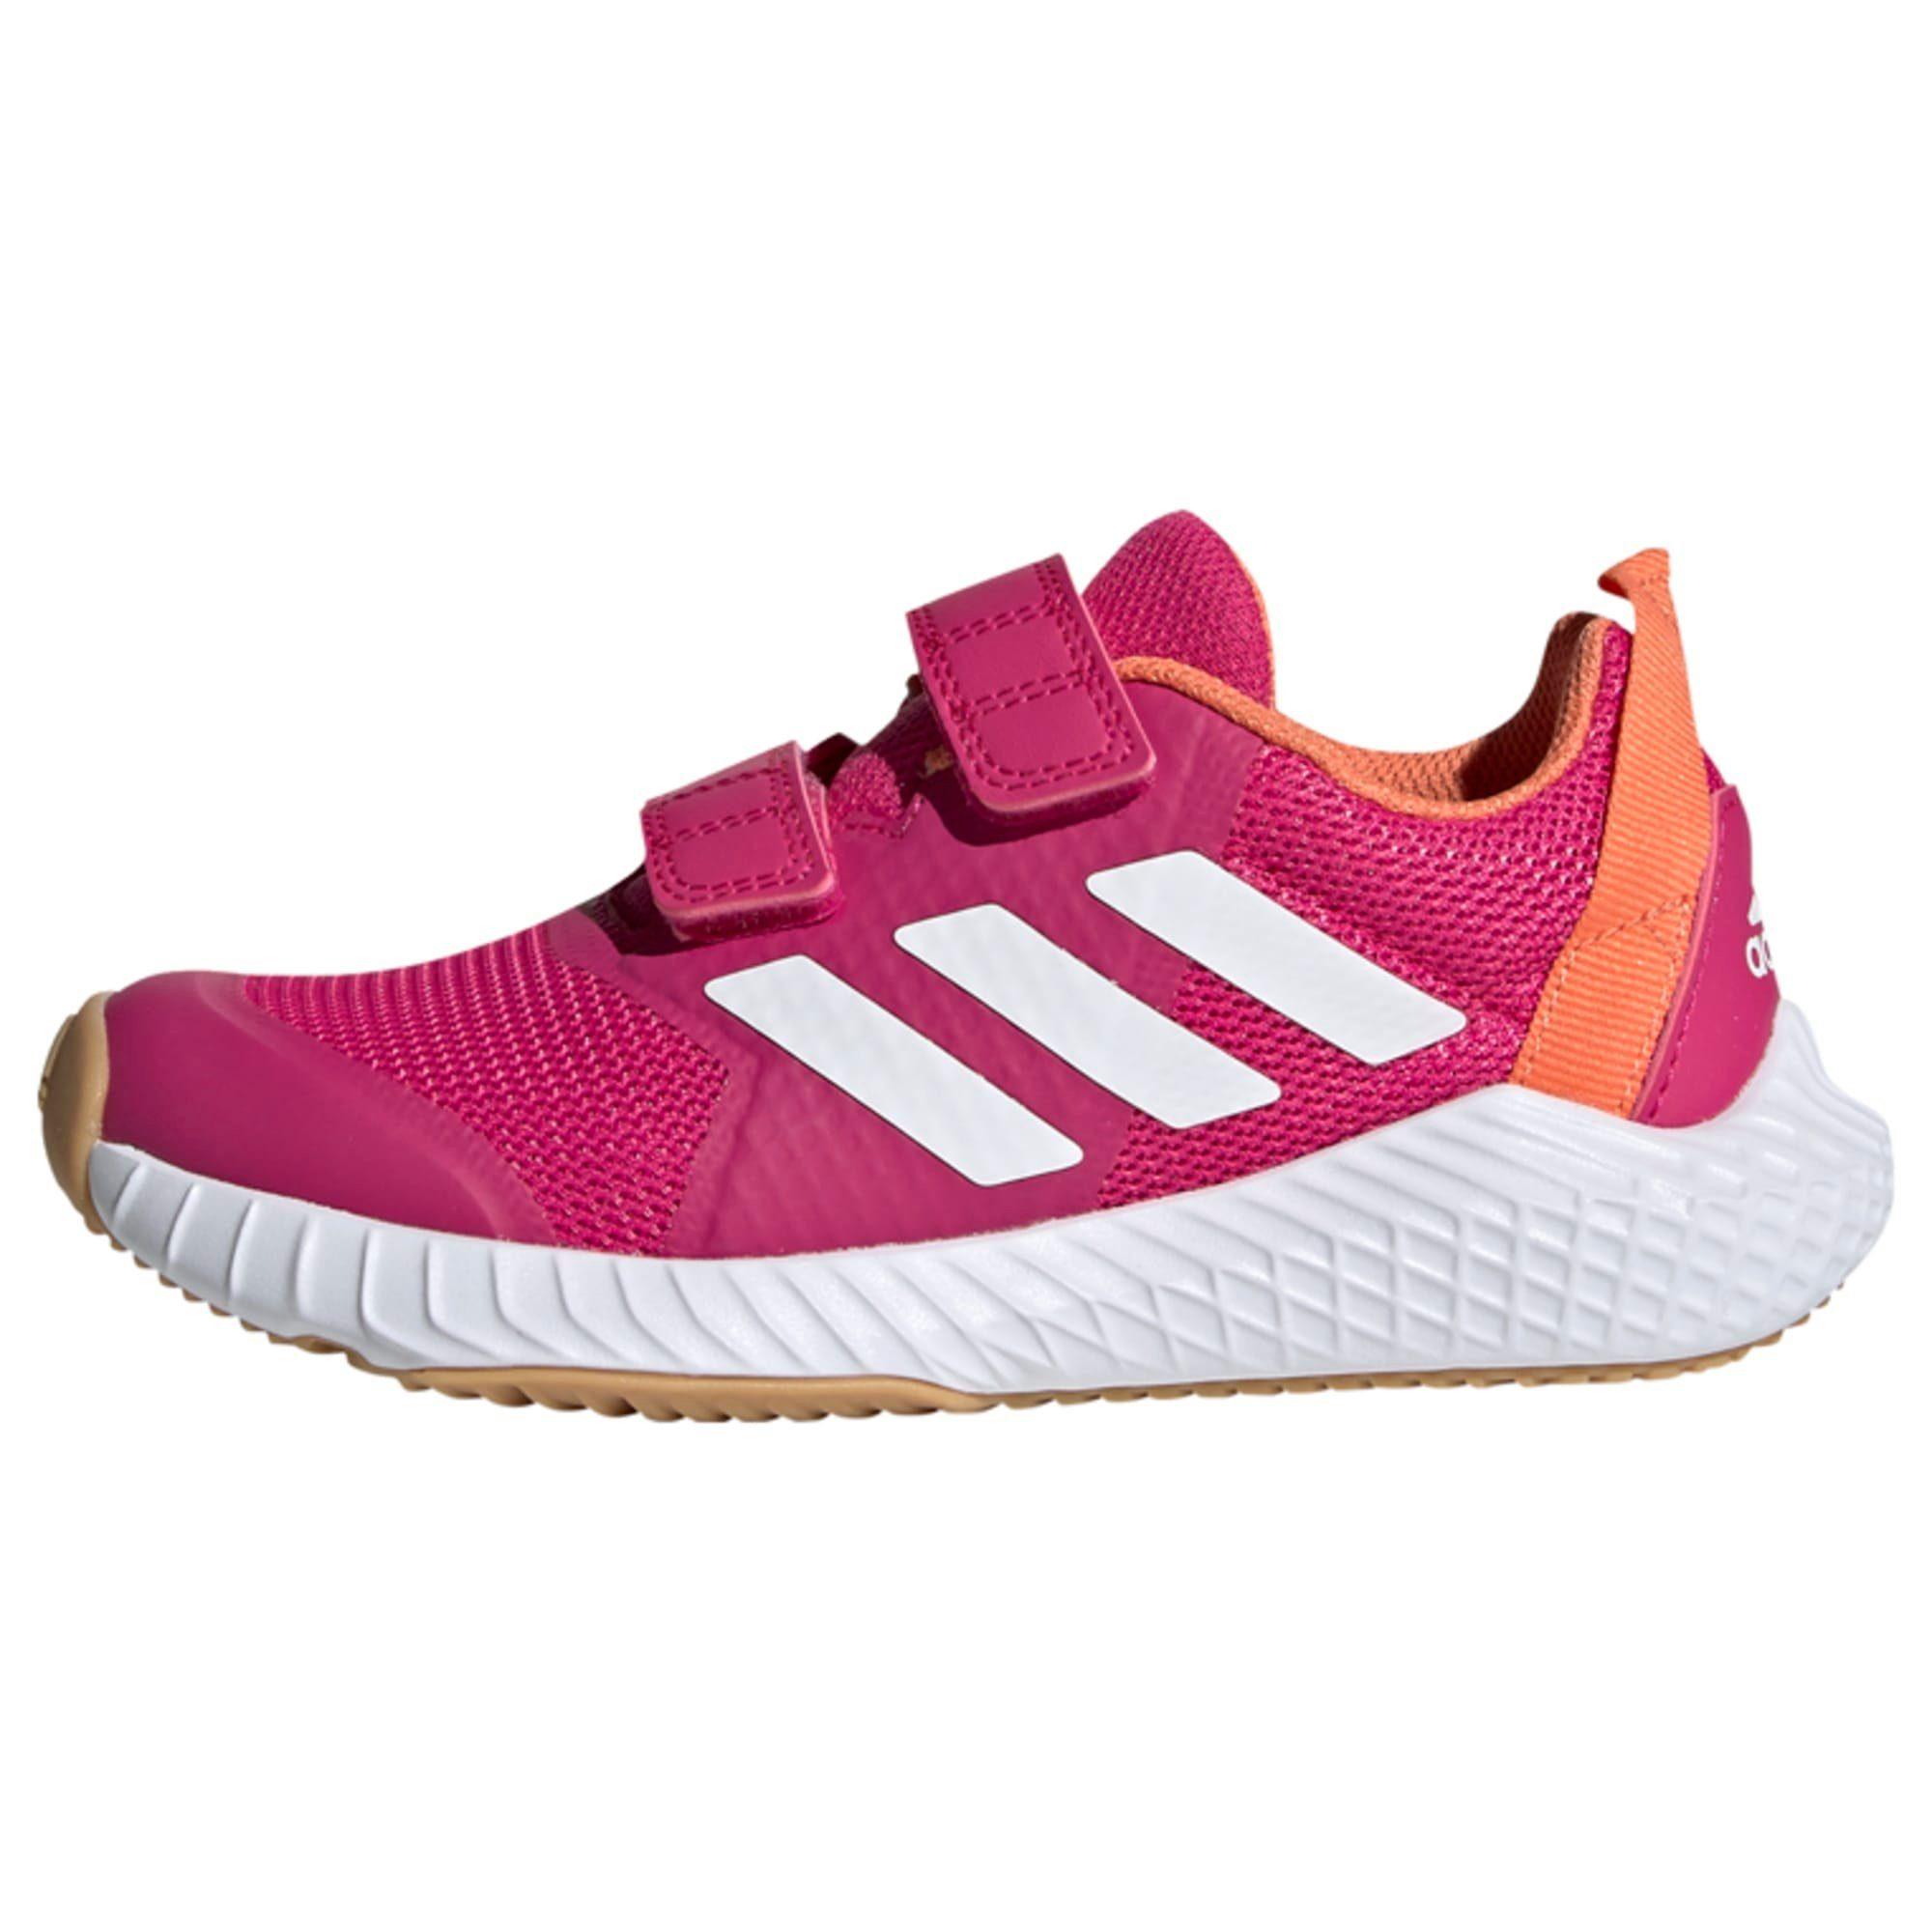 Unisex adidas Performance »FortaGym Shoes« Trainingsschuh Forta    04061618238885, 04061618238991, 04061618239035, 04061618242547